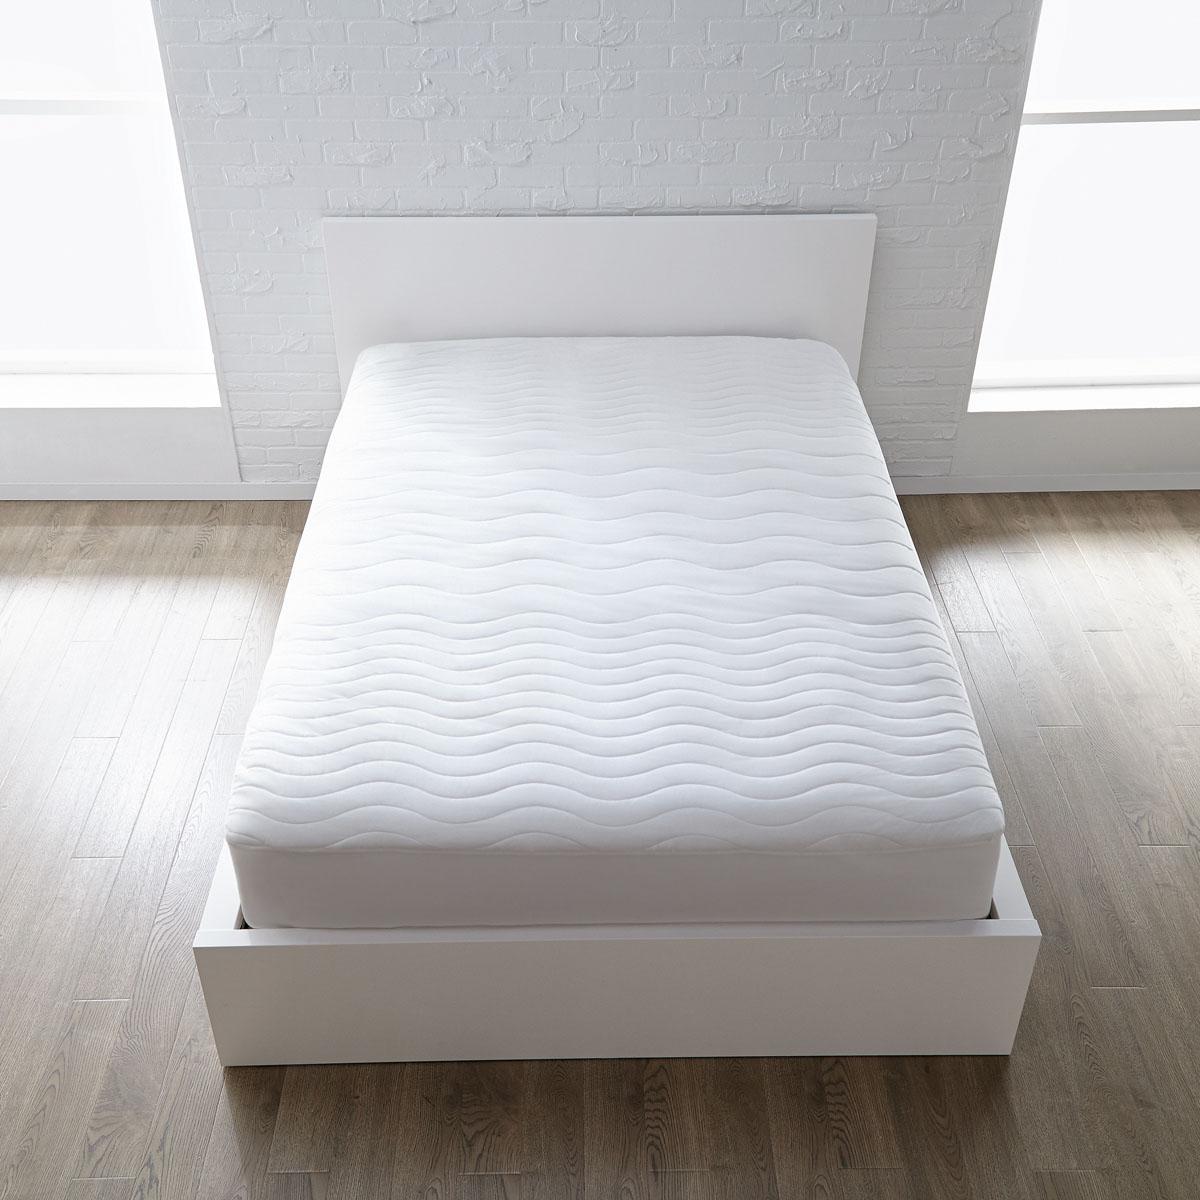 couvre matelas chauffant sunbeam health restore grand lit 2 places 7923 030 000 cn sunbeam. Black Bedroom Furniture Sets. Home Design Ideas